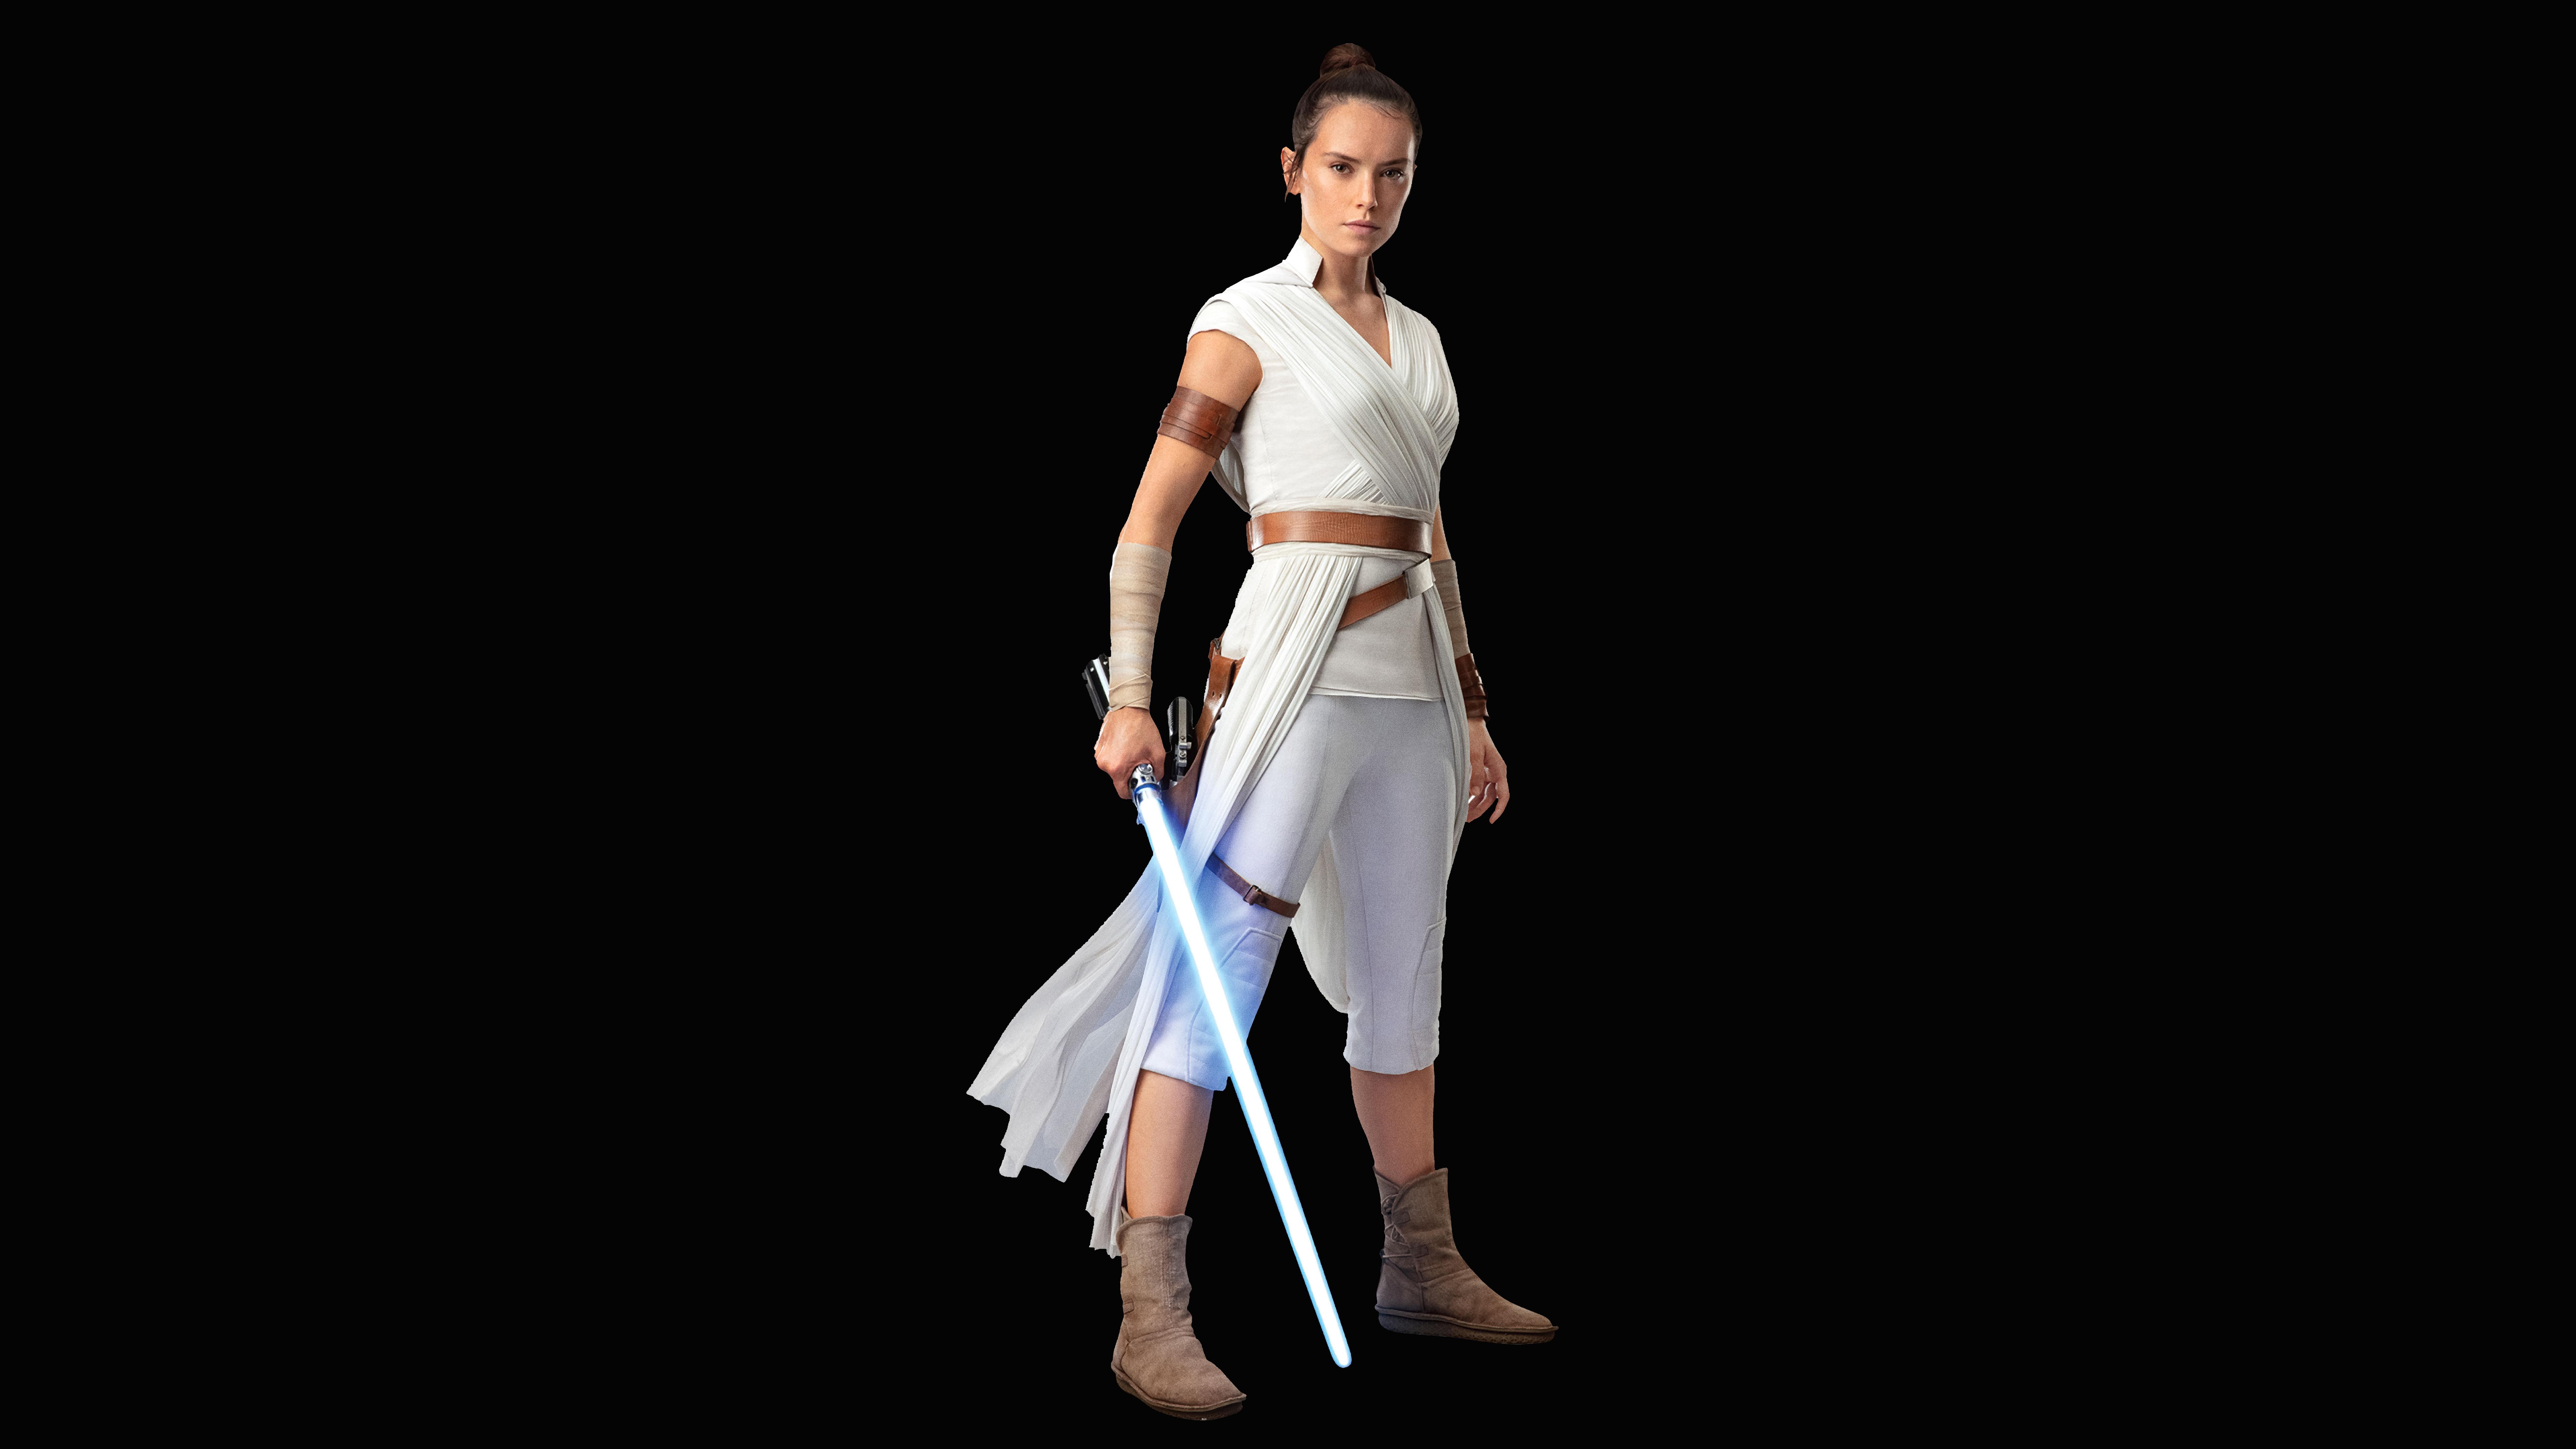 Rey 4k Wallpaper Daisy Ridley Star Wars The Rise Of Skywalker Black Background 5k 8k Movies 890